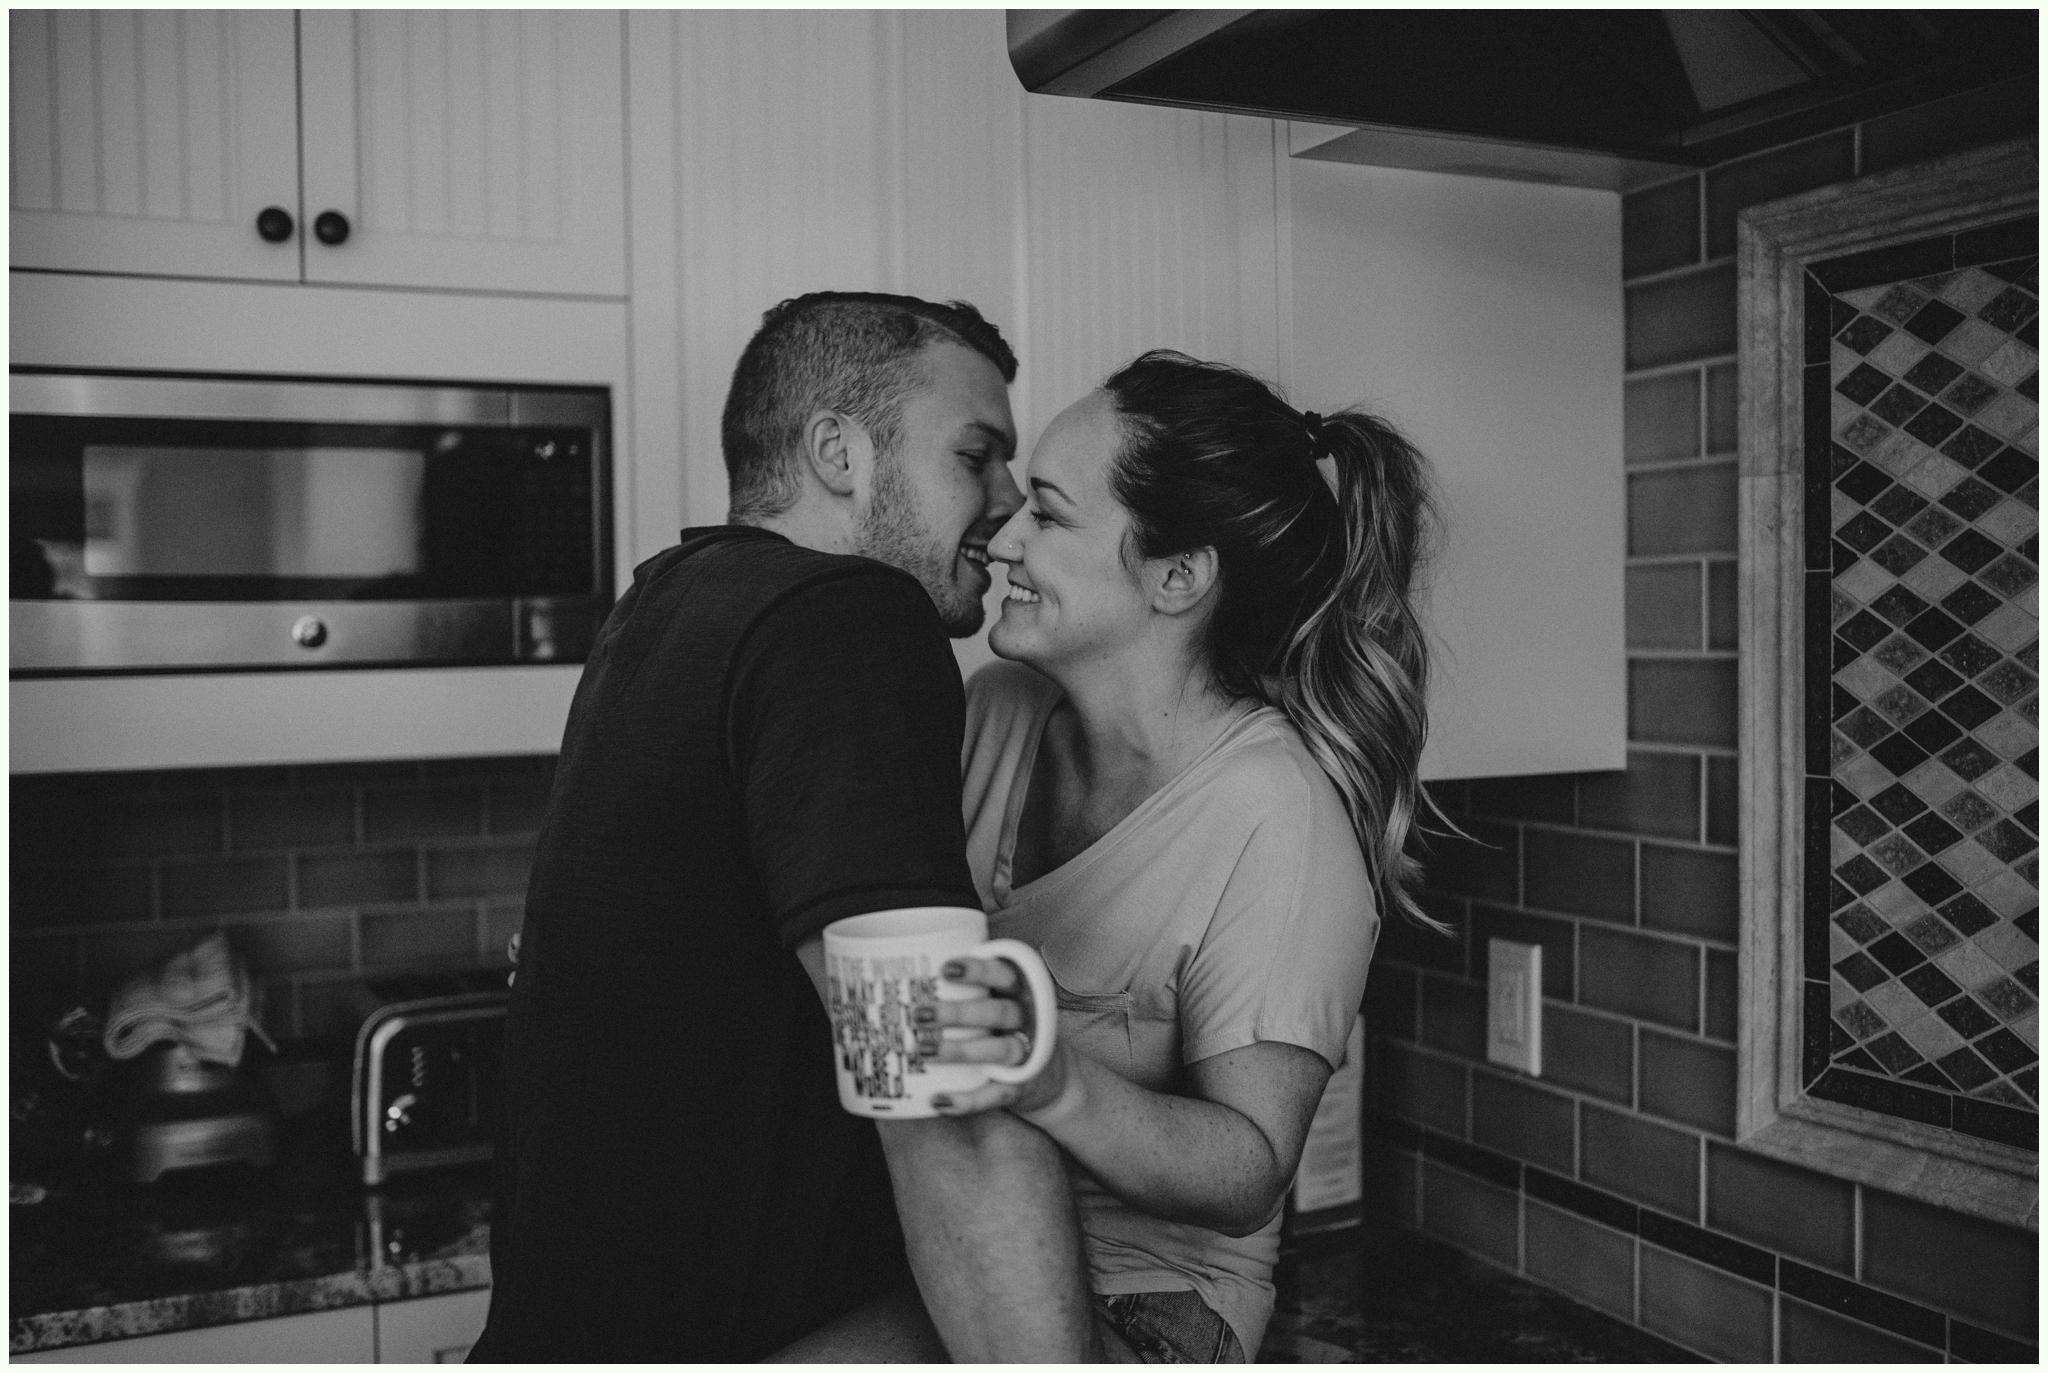 in-home-engagement-session-seattle-wedding-photographer-caitlyn-nikula-22.jpg